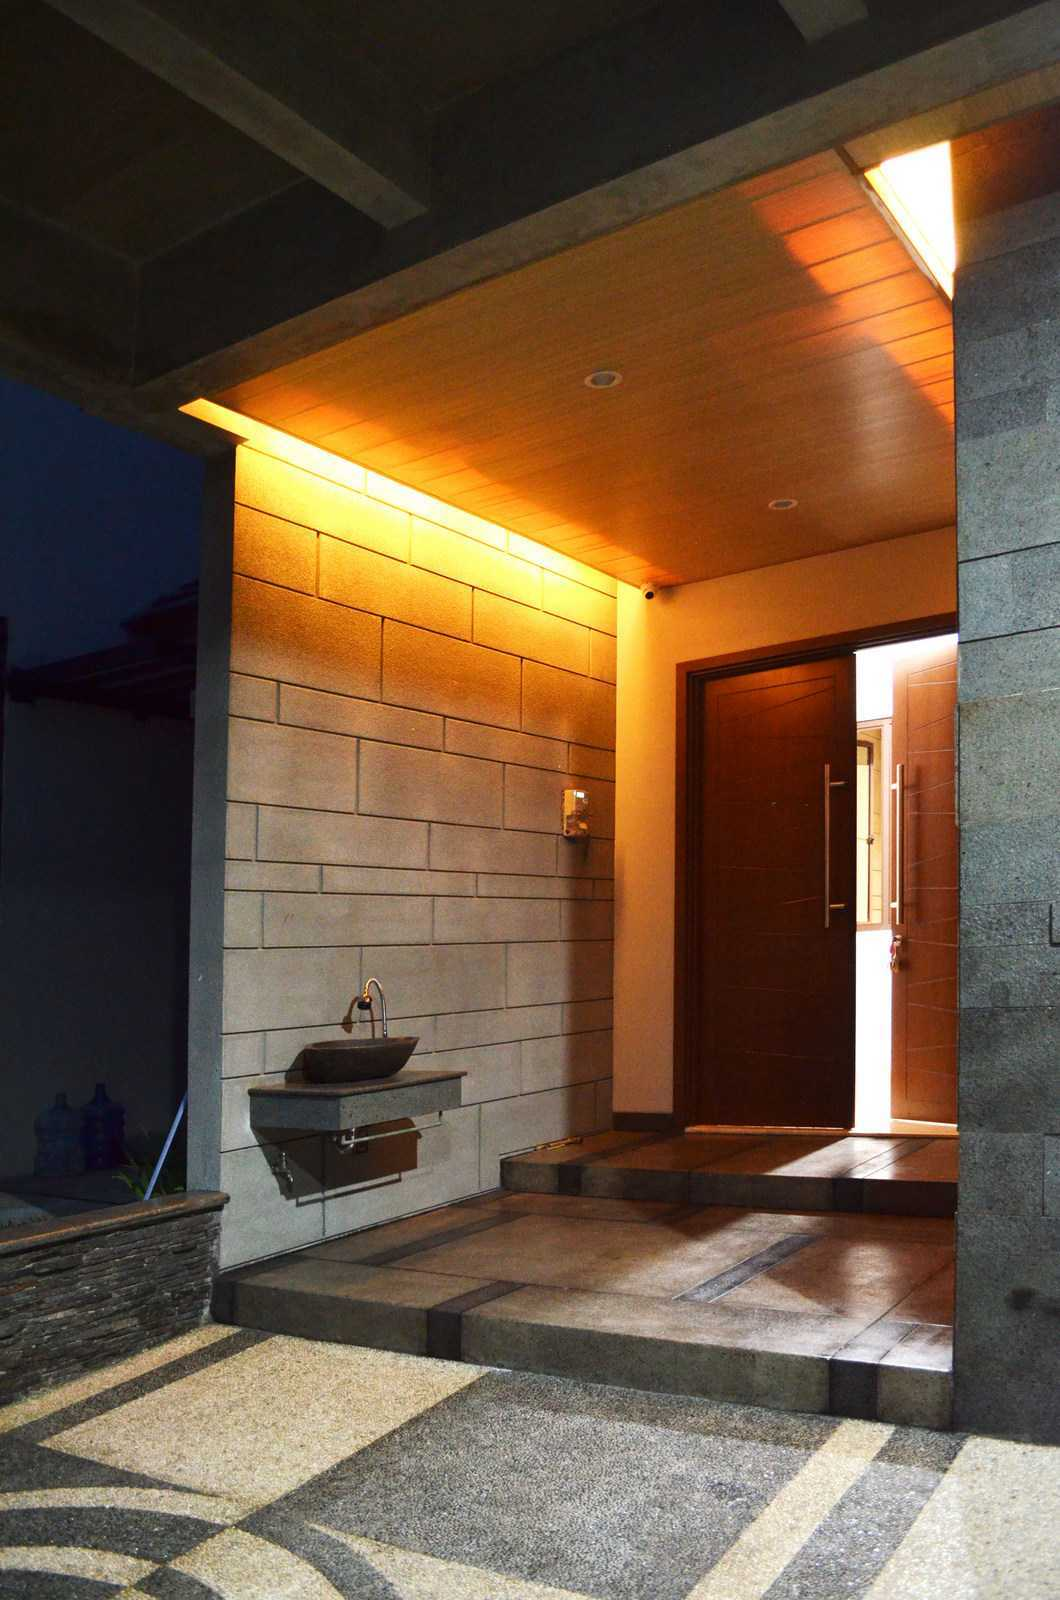 X3M Architects Nittaya A3 15 House Bsd Bsd Front Door   25324